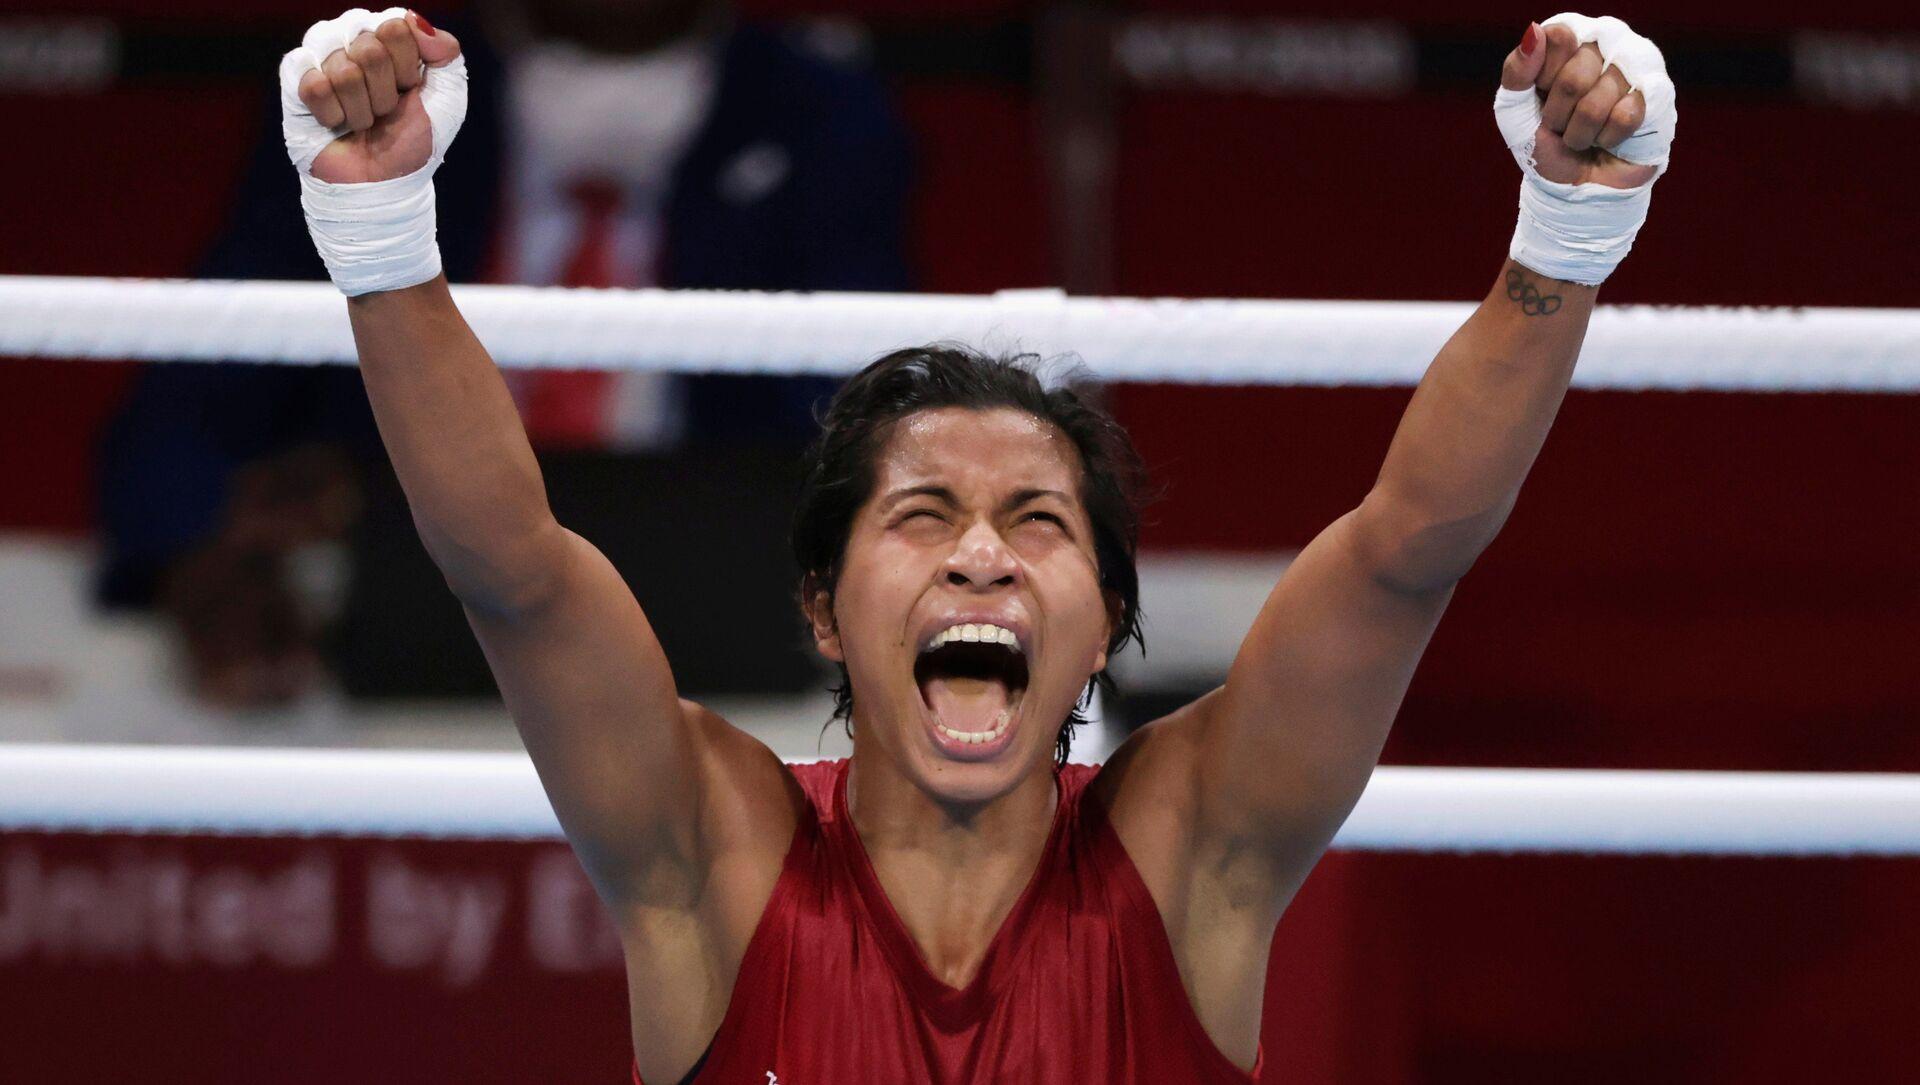 Tokyo 2020 Olympics - Boxing - Women's Welterweight - Quarterfinal - Kokugikan Arena - Tokyo, Japan - July 30, 2021. Lovlina Borgohain of India celebrates after the fight against Chen Nien-Chin of Taiwan. - Sputnik International, 1920, 30.07.2021